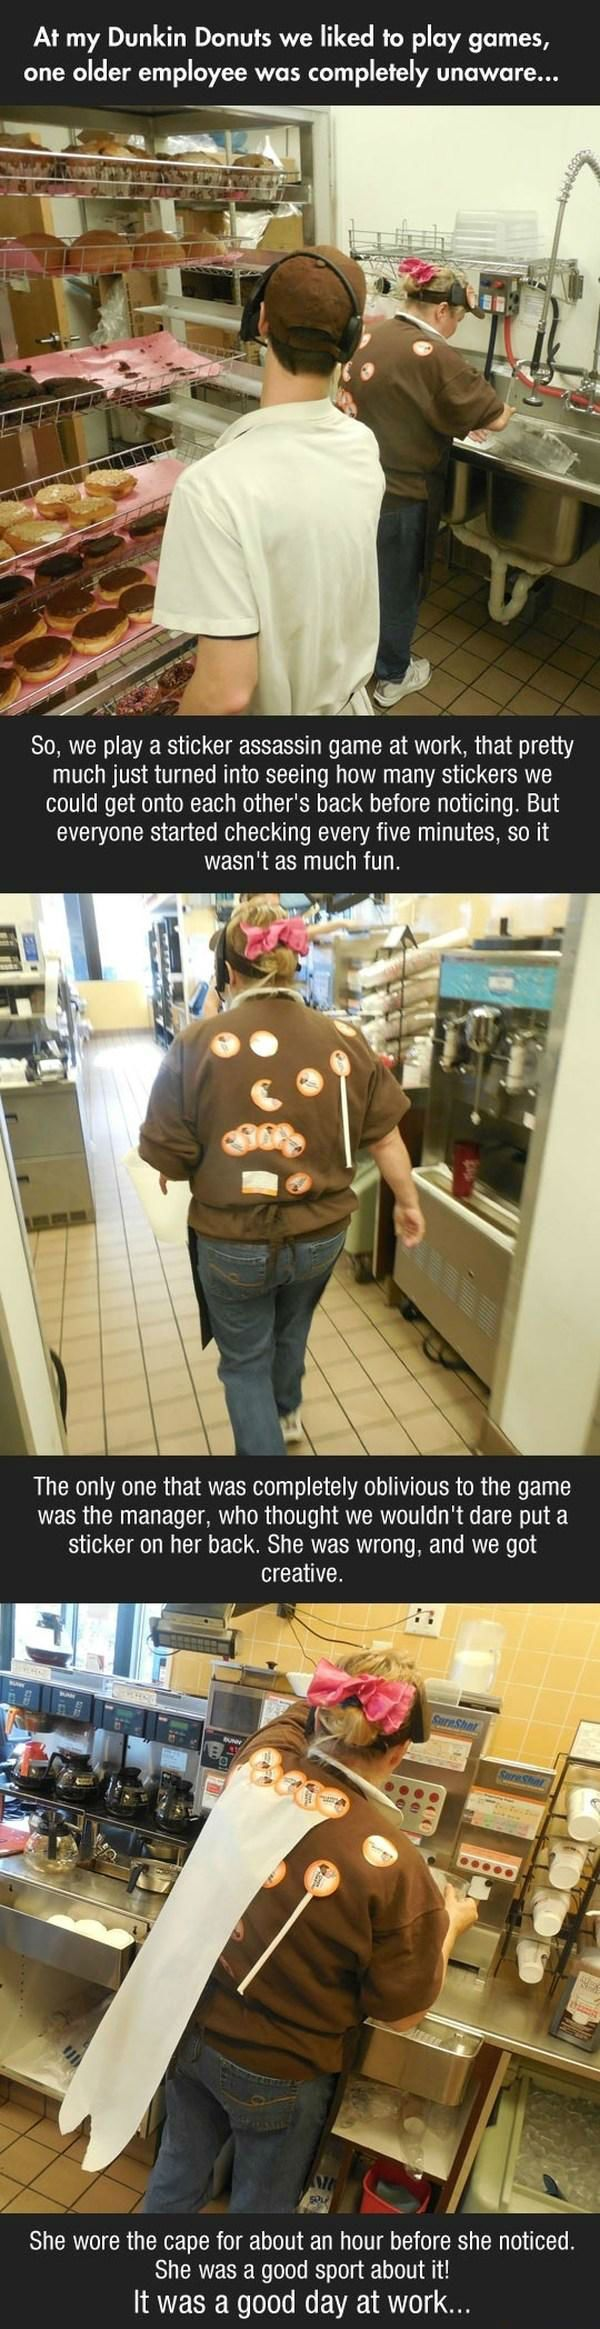 The Dunkin Donut sticker assassin game!